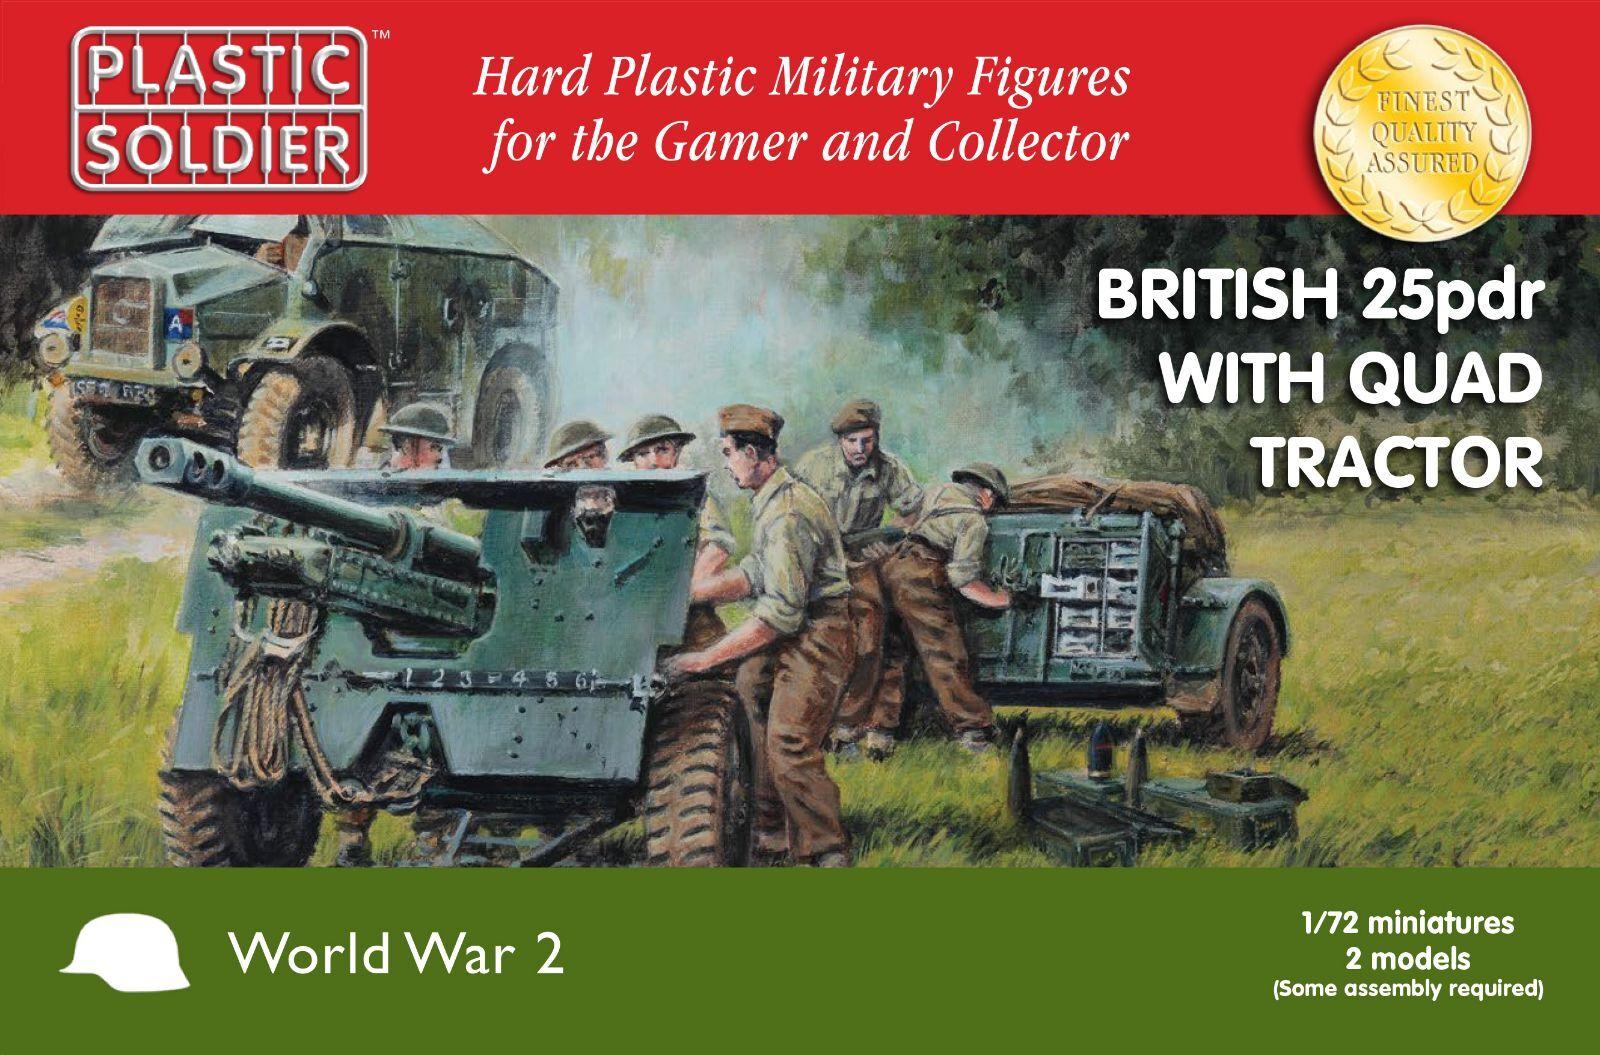 WW2G20006 - BRITISH 25PDR & MORRIS QUAD TRACTOR - PLASTIC SOLDIER COMPANY 1 72